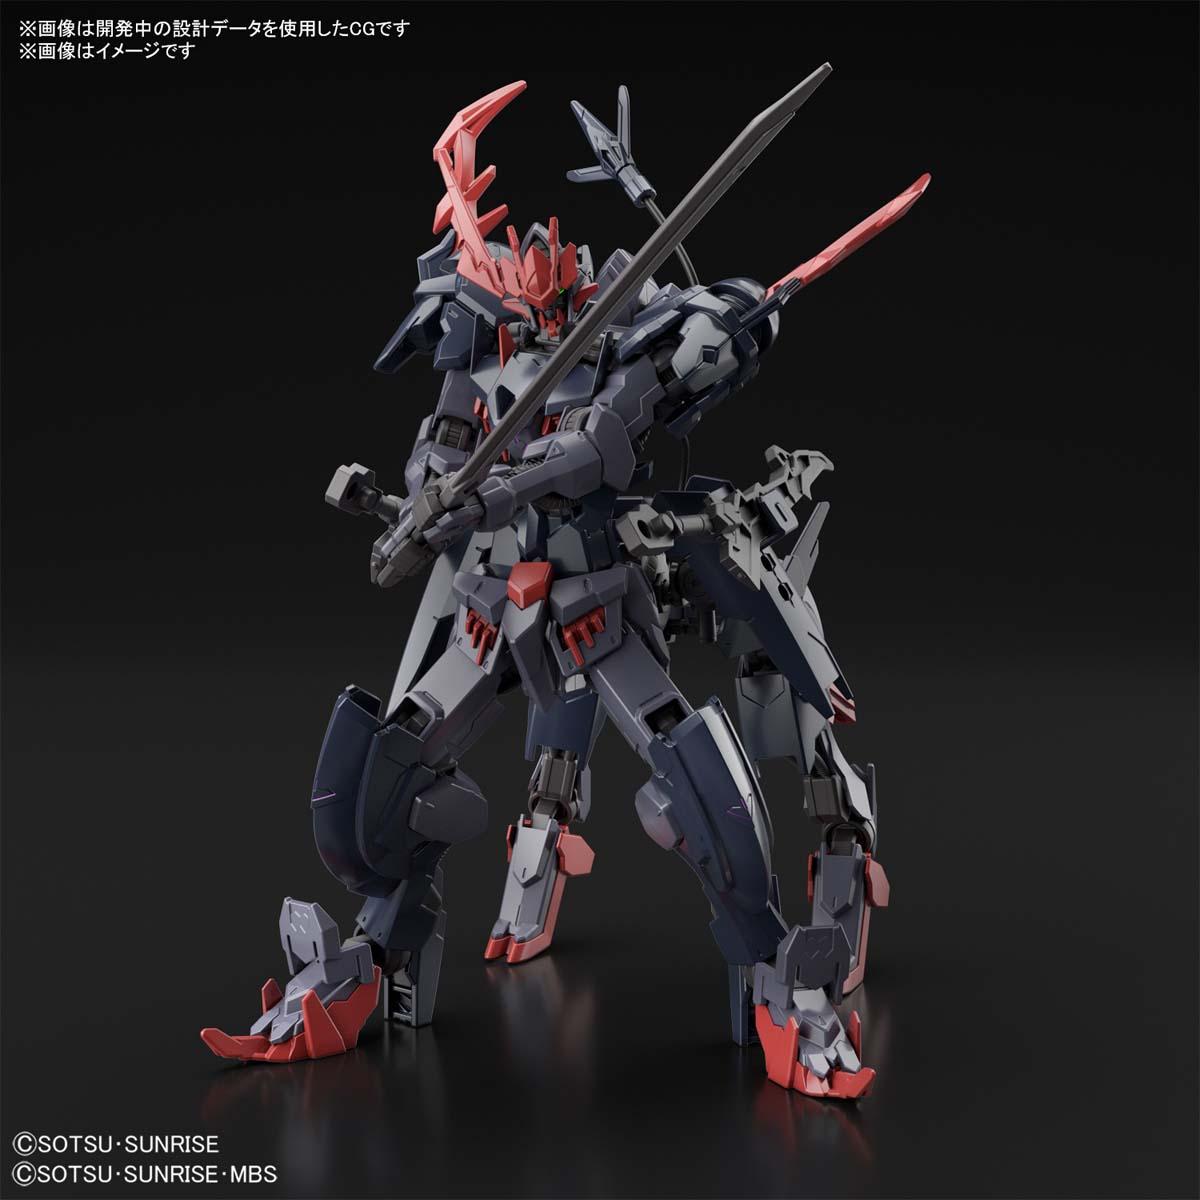 HG 1/144『ガンダムバルバタウロス』ガンダムブレイカー バトローグ プラモデル-007